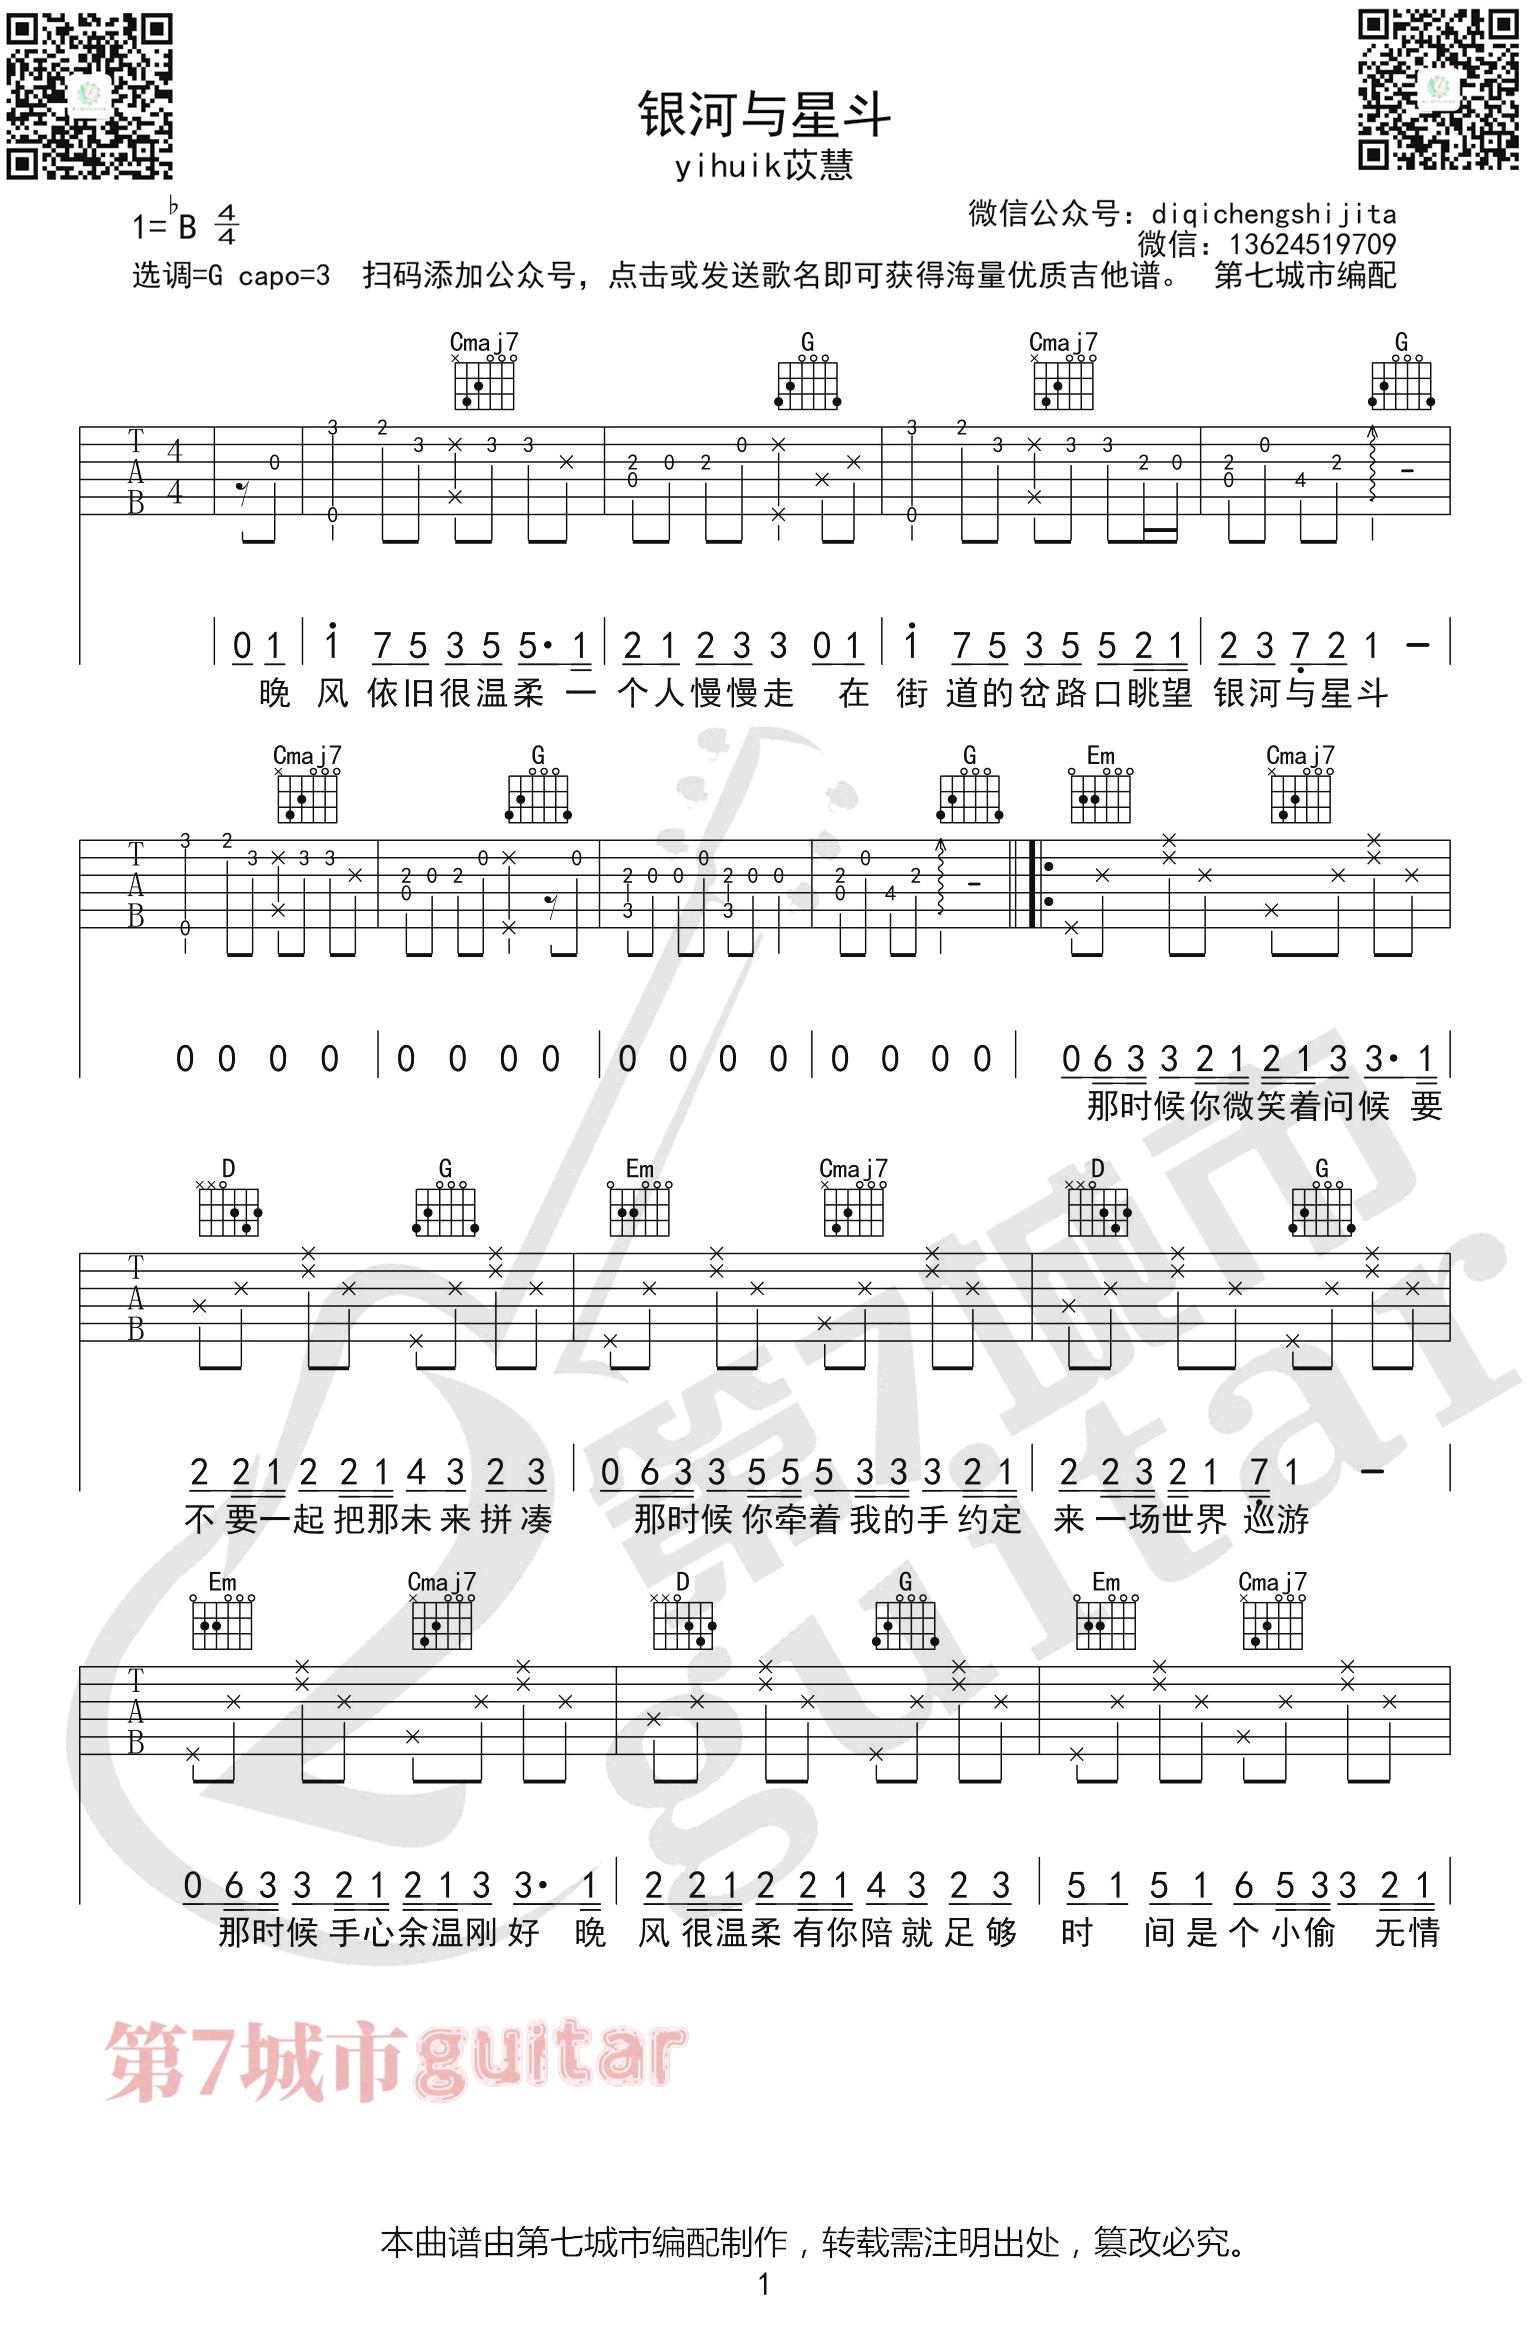 yihuik苡慧-银河与星斗吉他谱-1